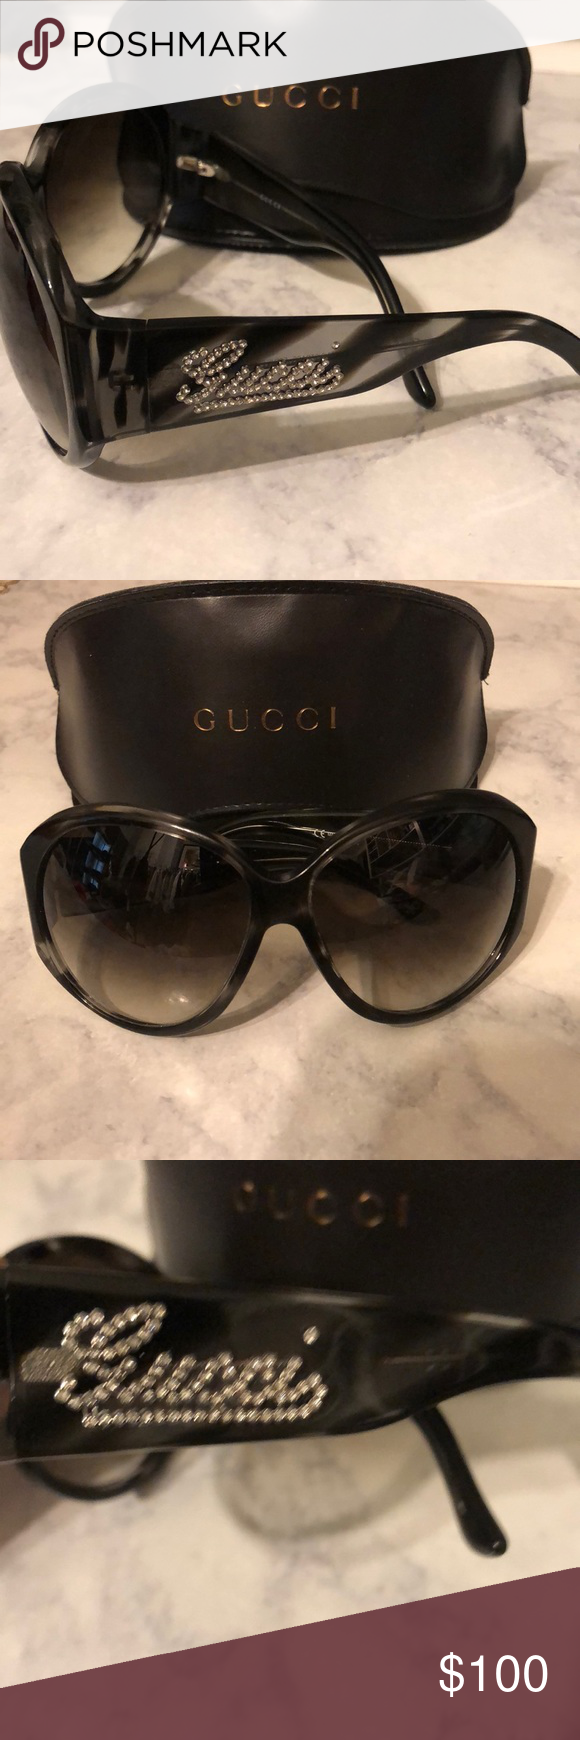 d4b23021183 Gucci Strass Crystal Logo Sunglasses Gucci Strass Crystal Logo oversize  Sunglasses. GG 2927 S